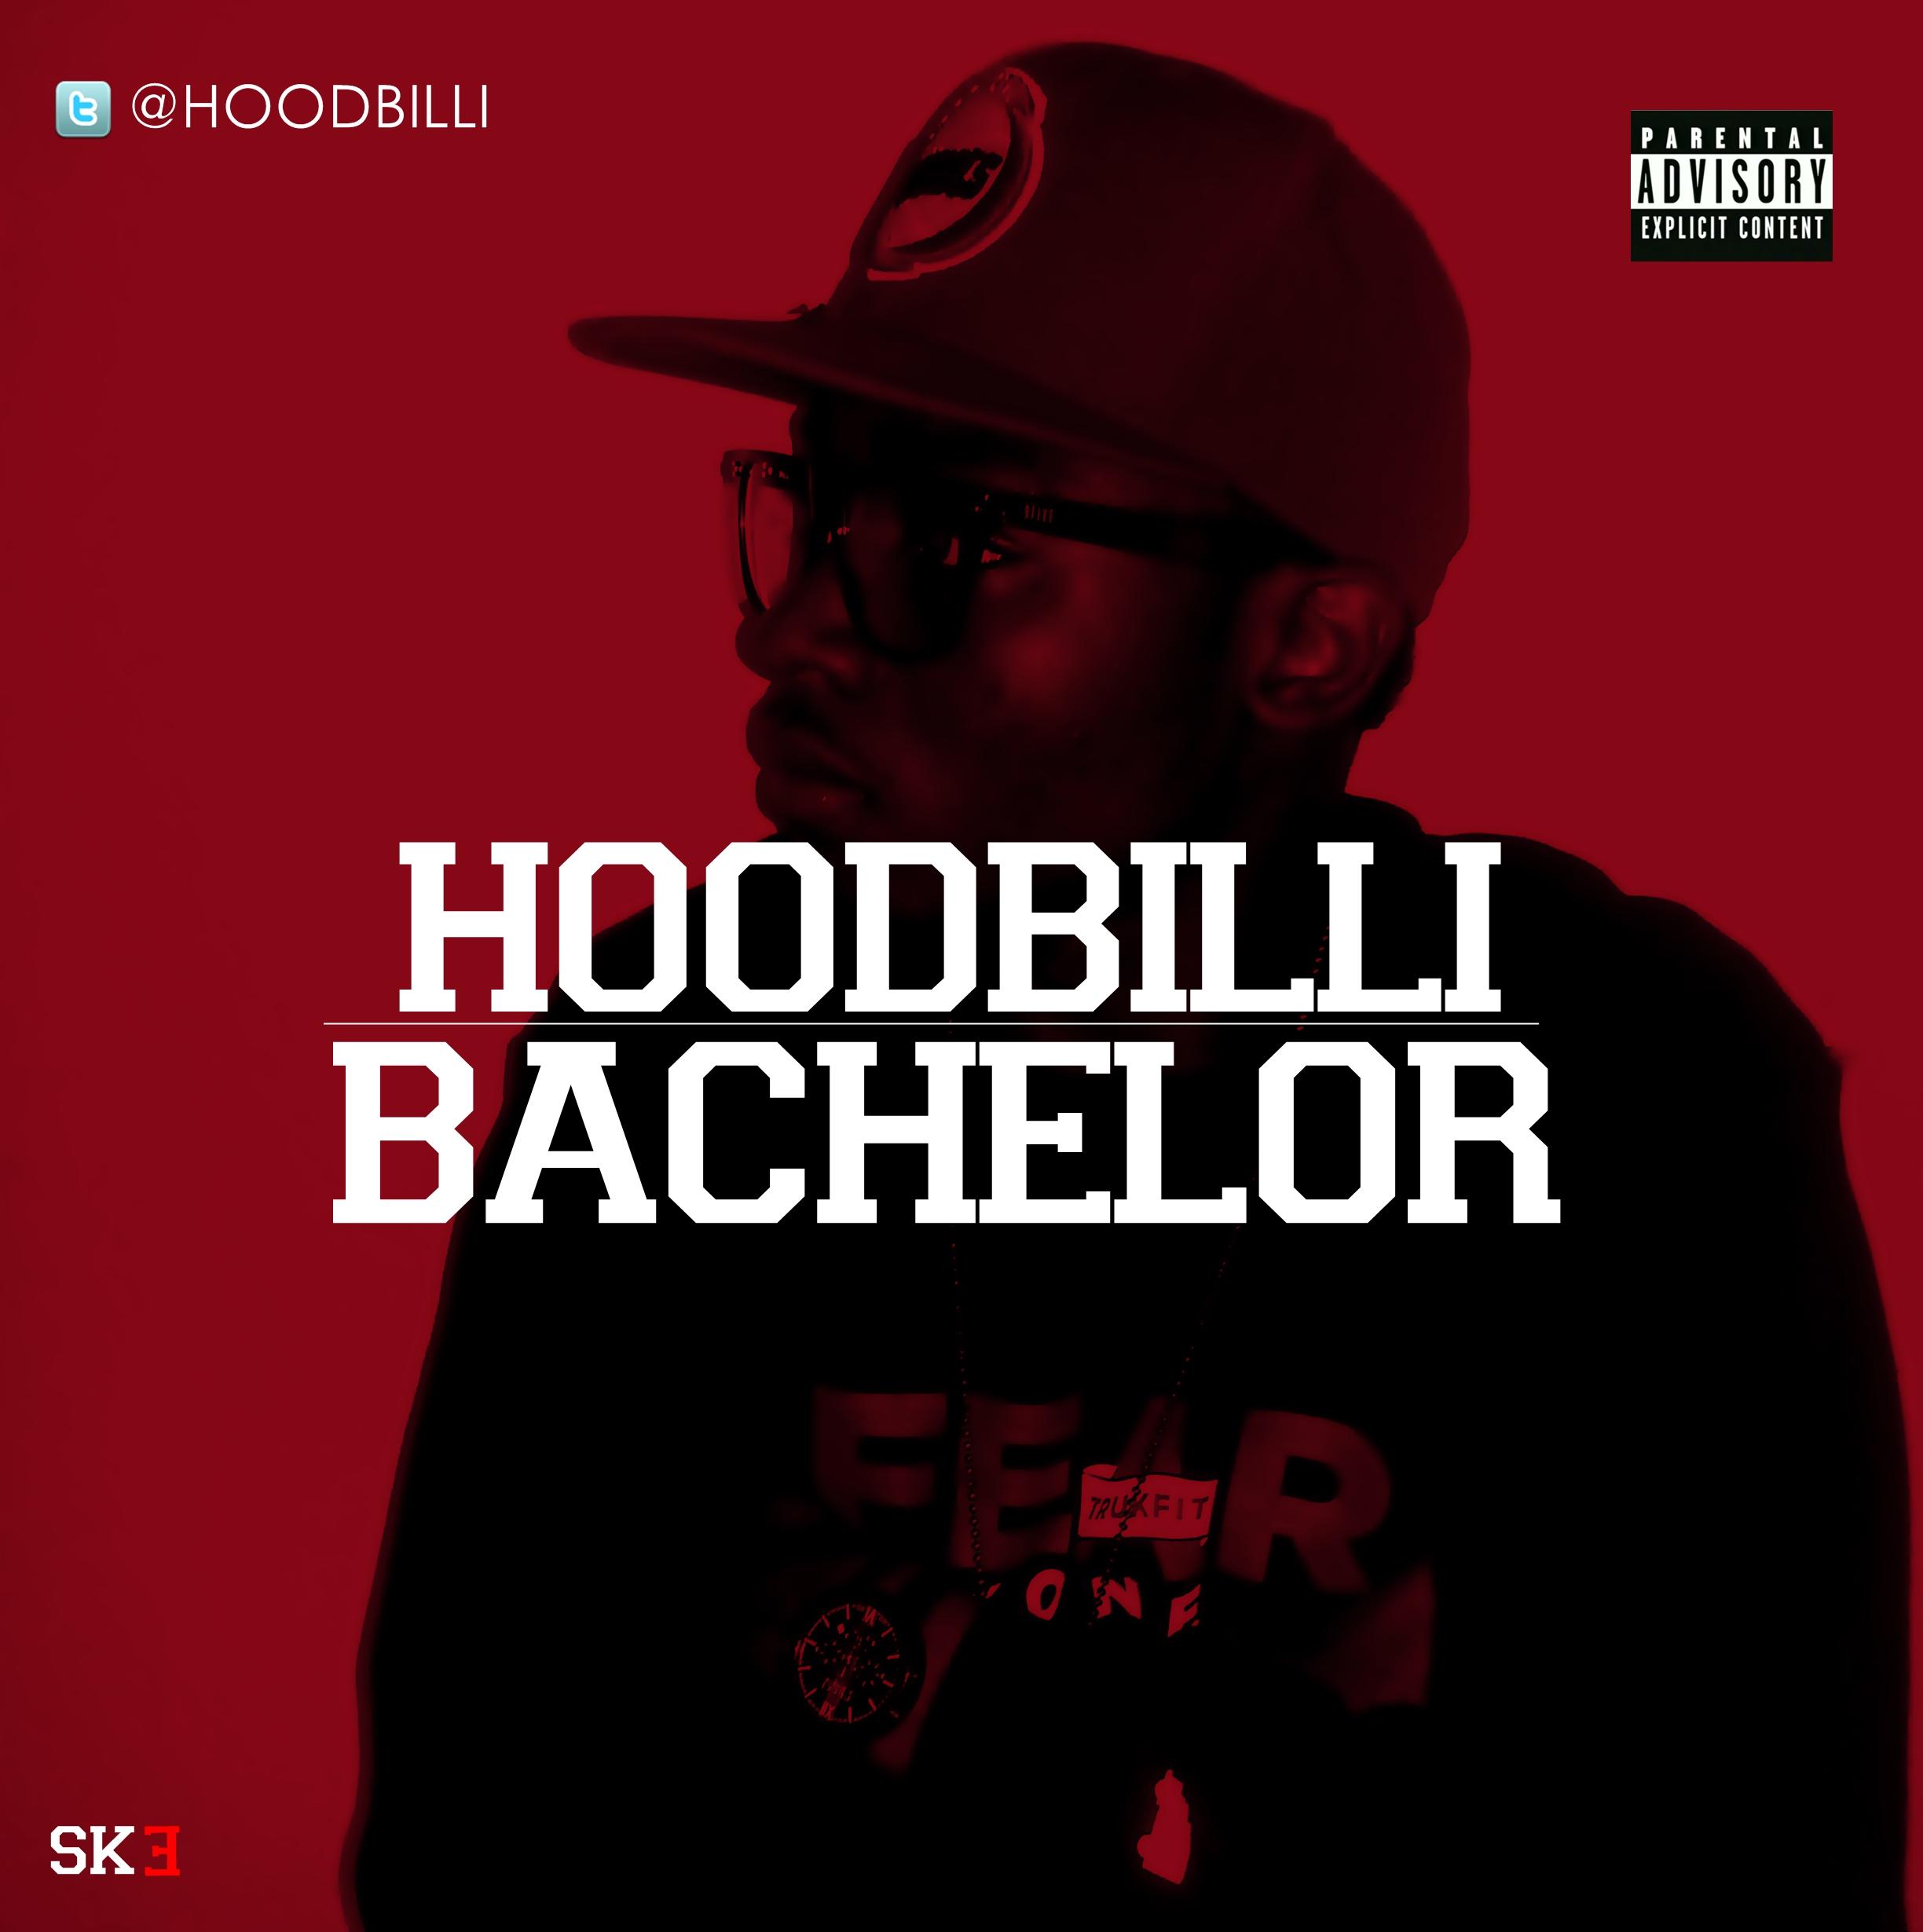 Hoodbilli - BACHELOR [a D'banj cover] Artwork   AceWorldTeam.com